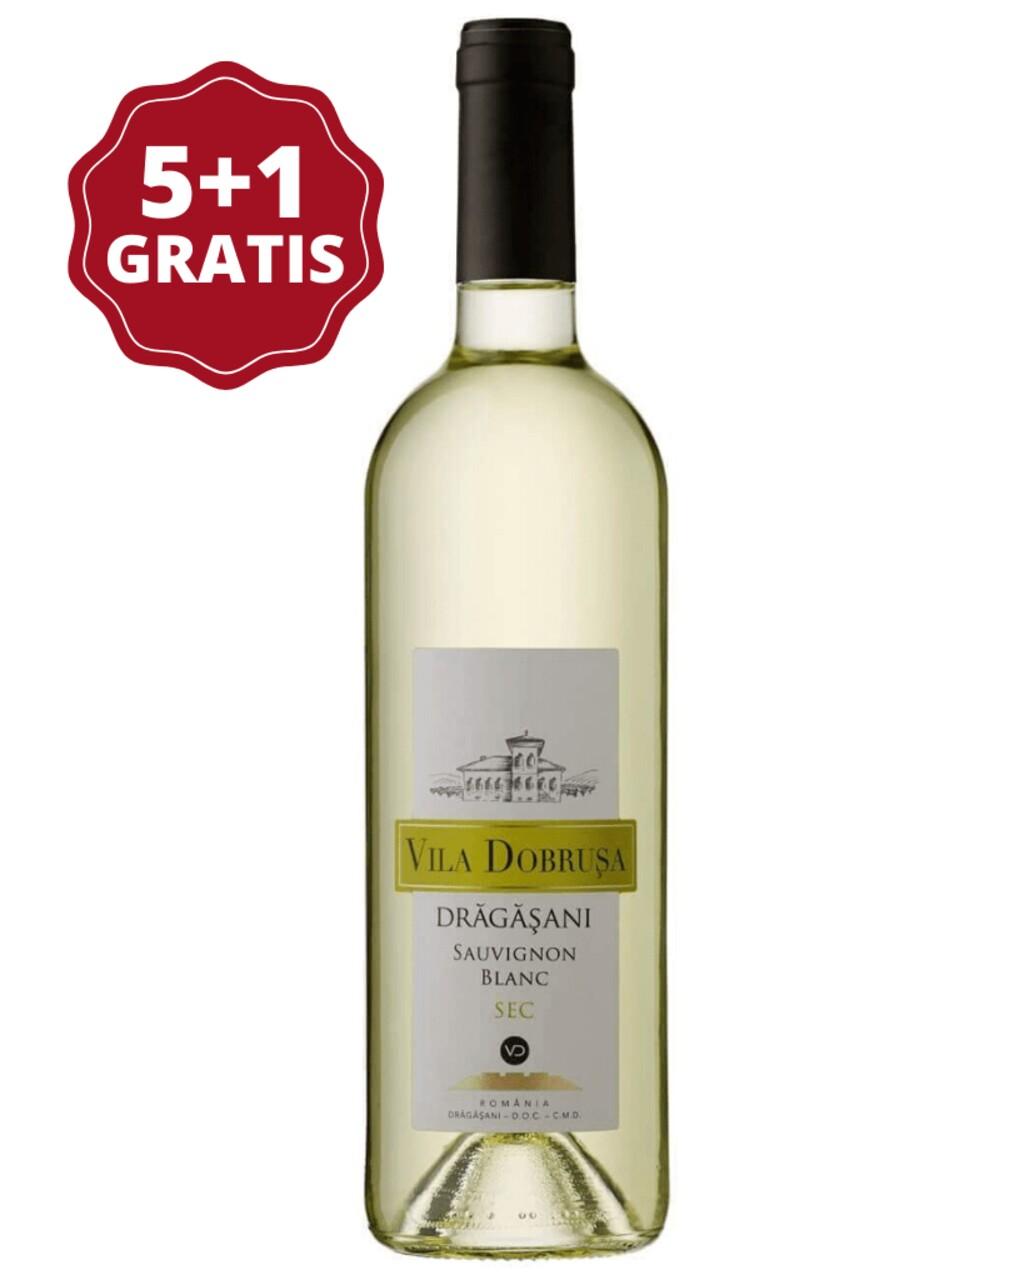 Avincis Vila Dobrusa Sauvignon Blanc 5+1